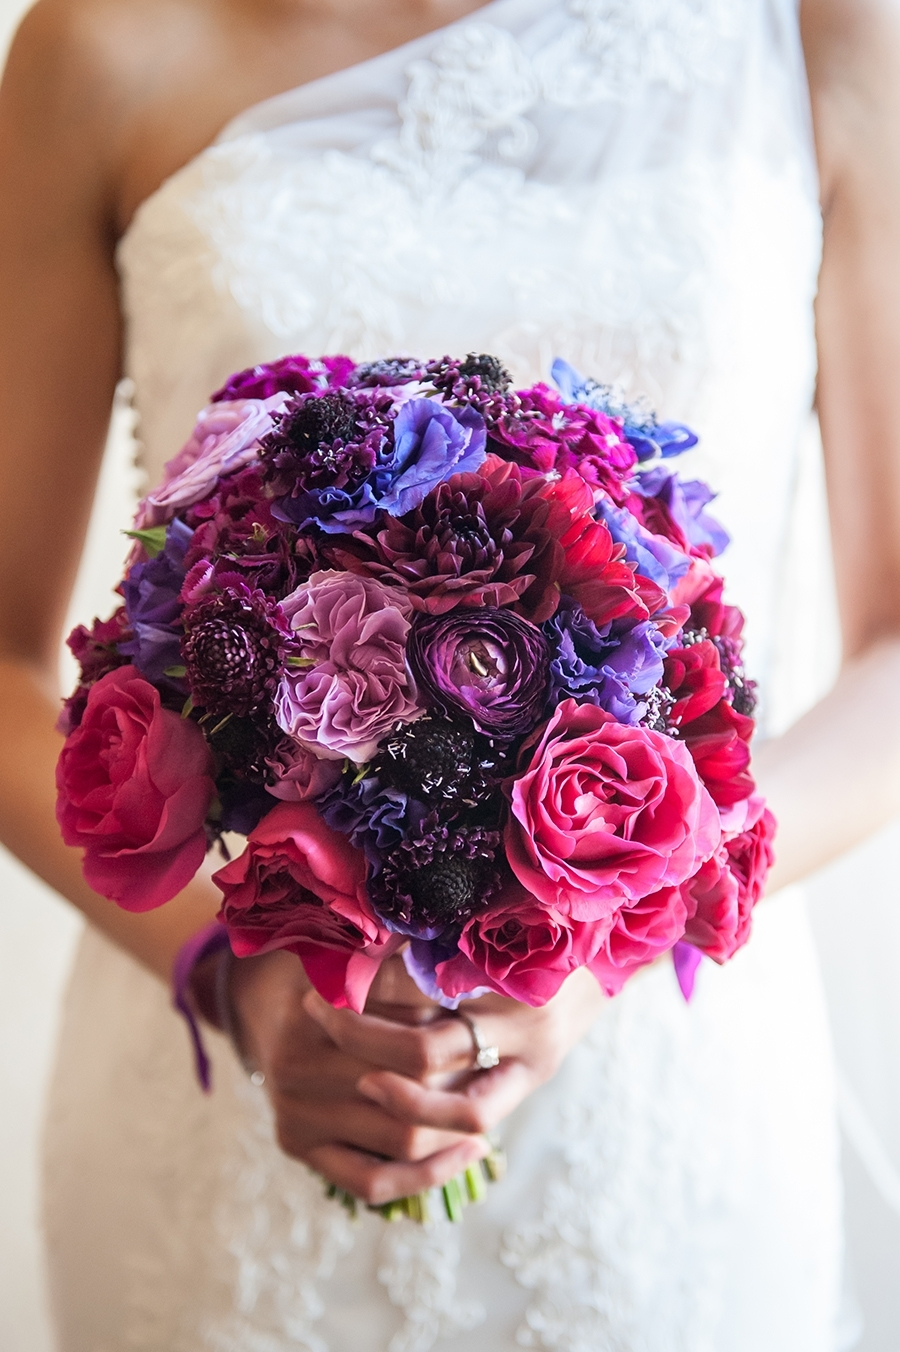 Jewel toned rose bouquet